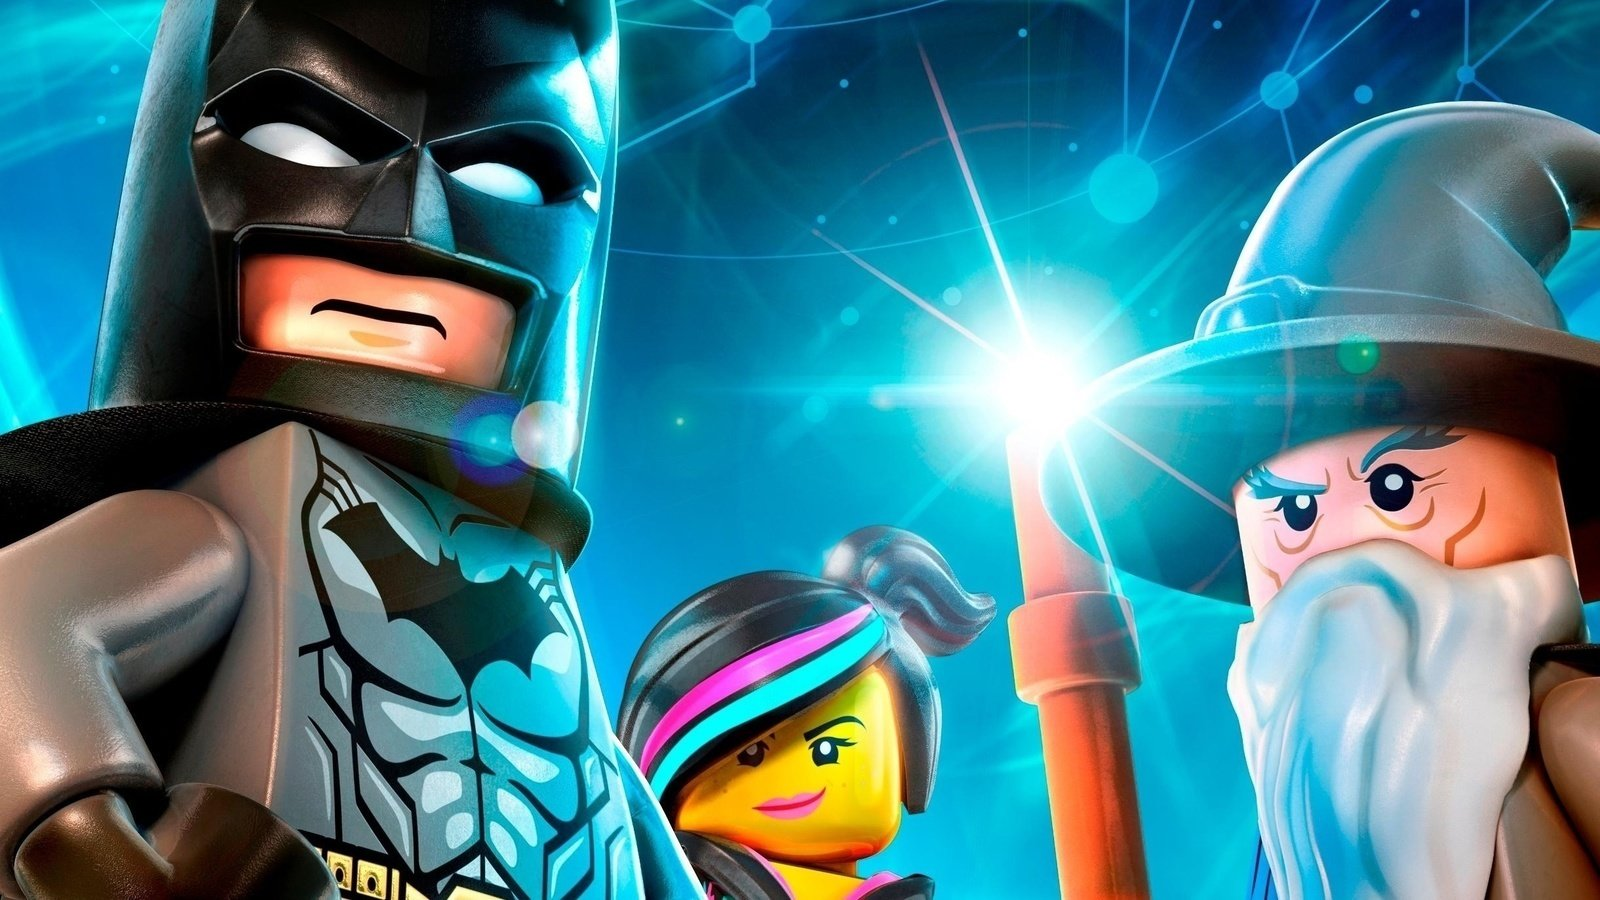 LEGO Batman, Wildstyle and Gandalf Image